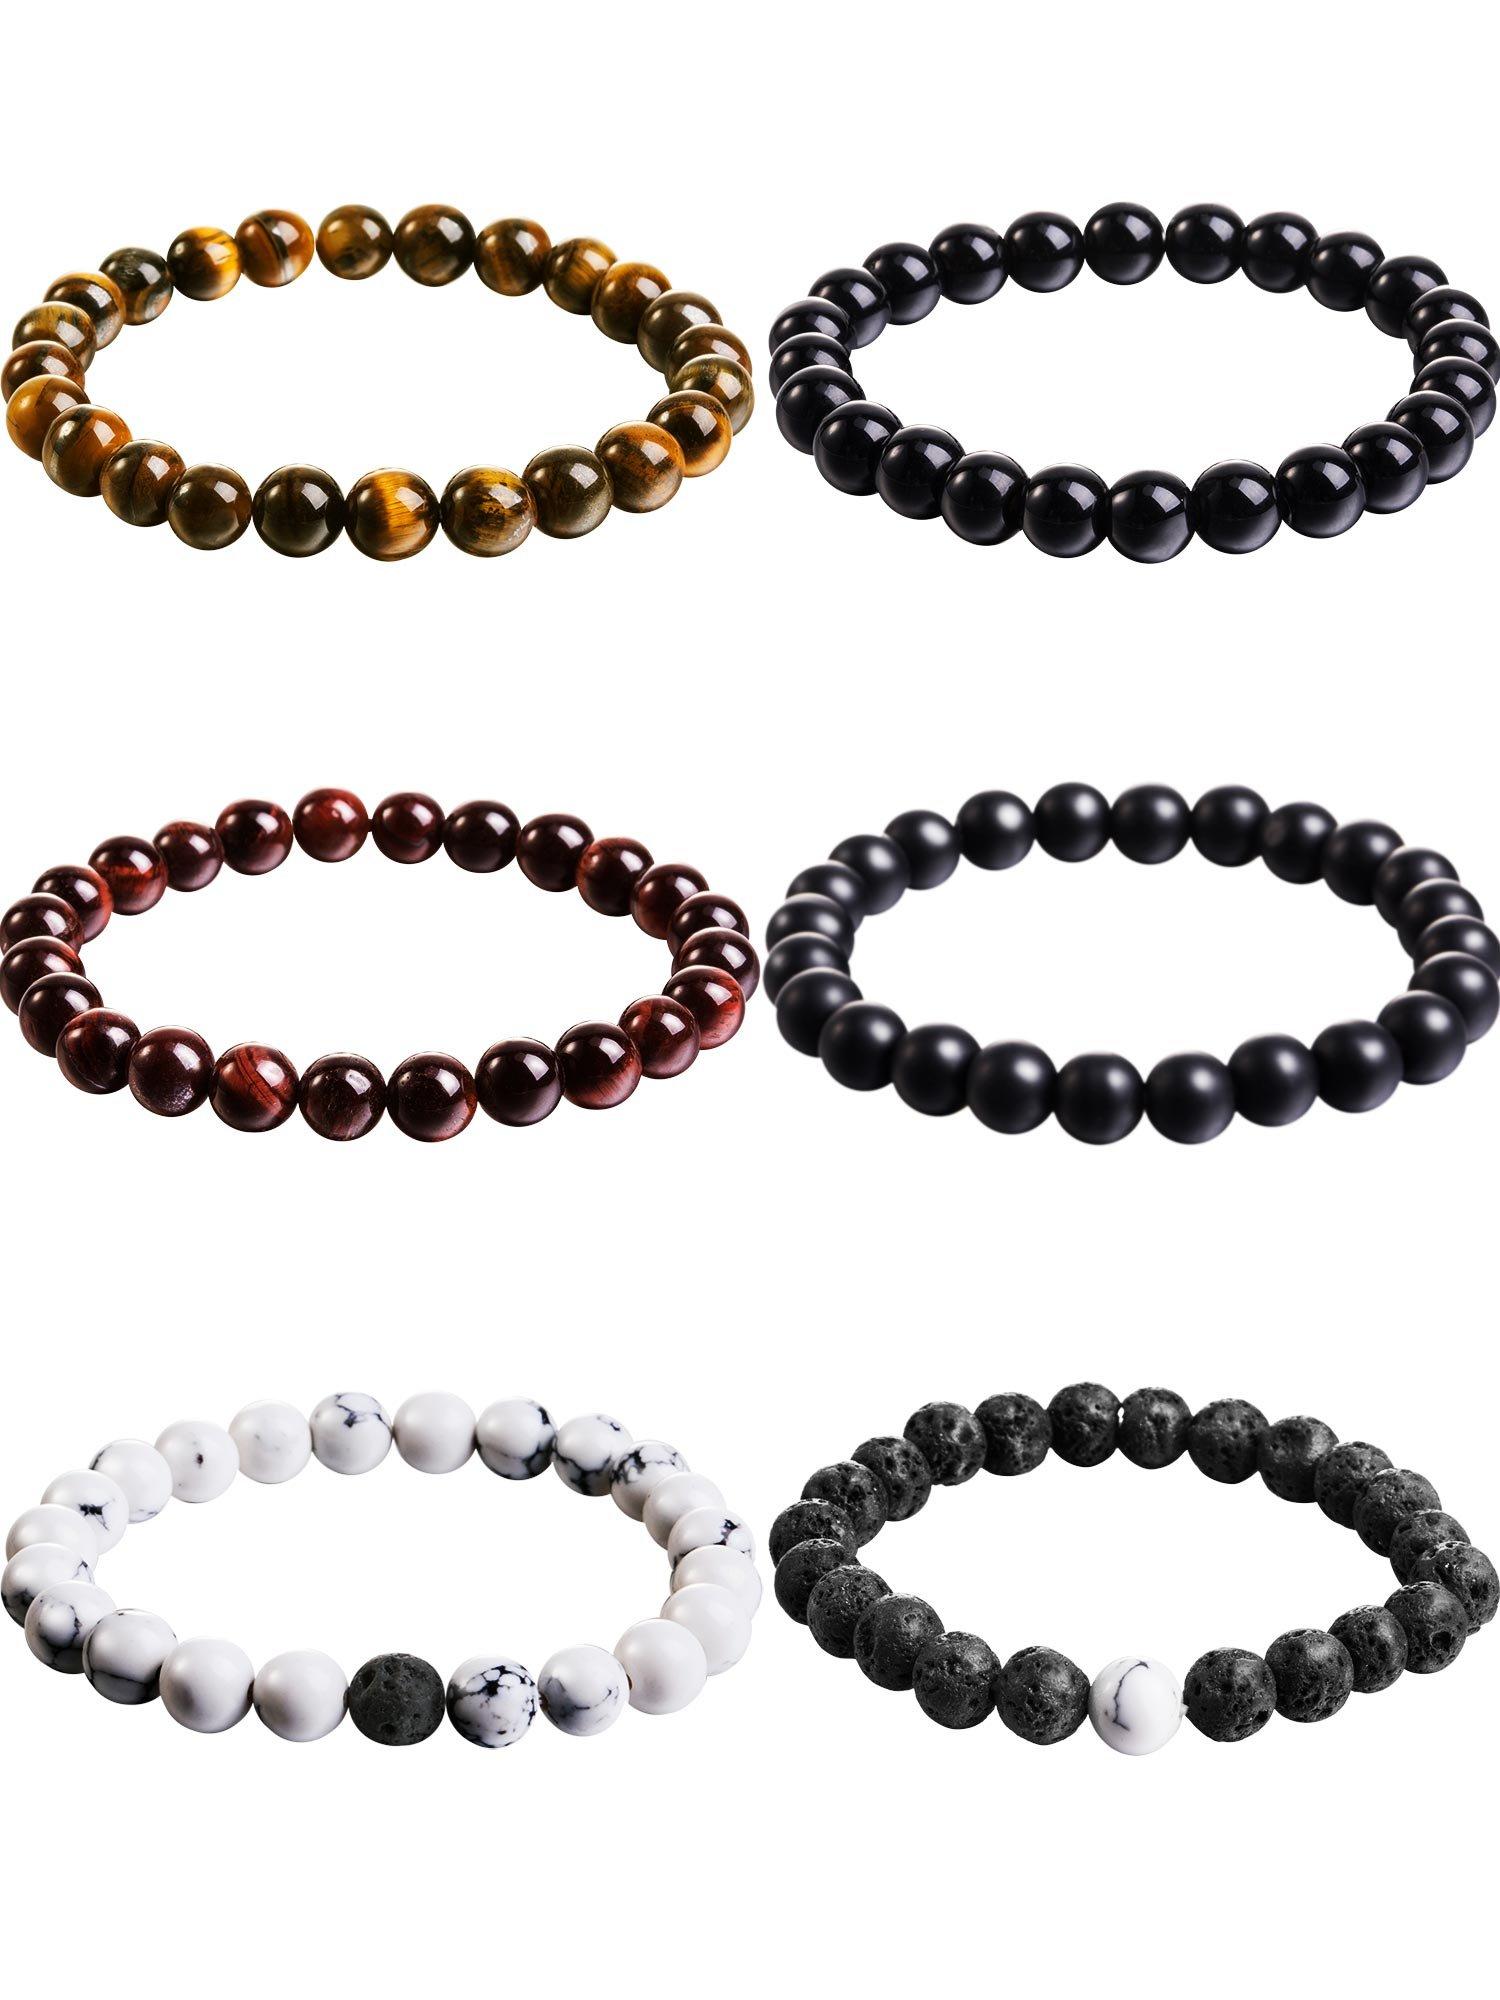 Hestya 6 Pieces 8 mm Tiger Eye Stone Beads Bracelet, Stone Bracelets and Volcanic Rock White Howlite Diffuser Bracelet Yoga Elastic Bracelet Bangle for Men Women (Style 1)